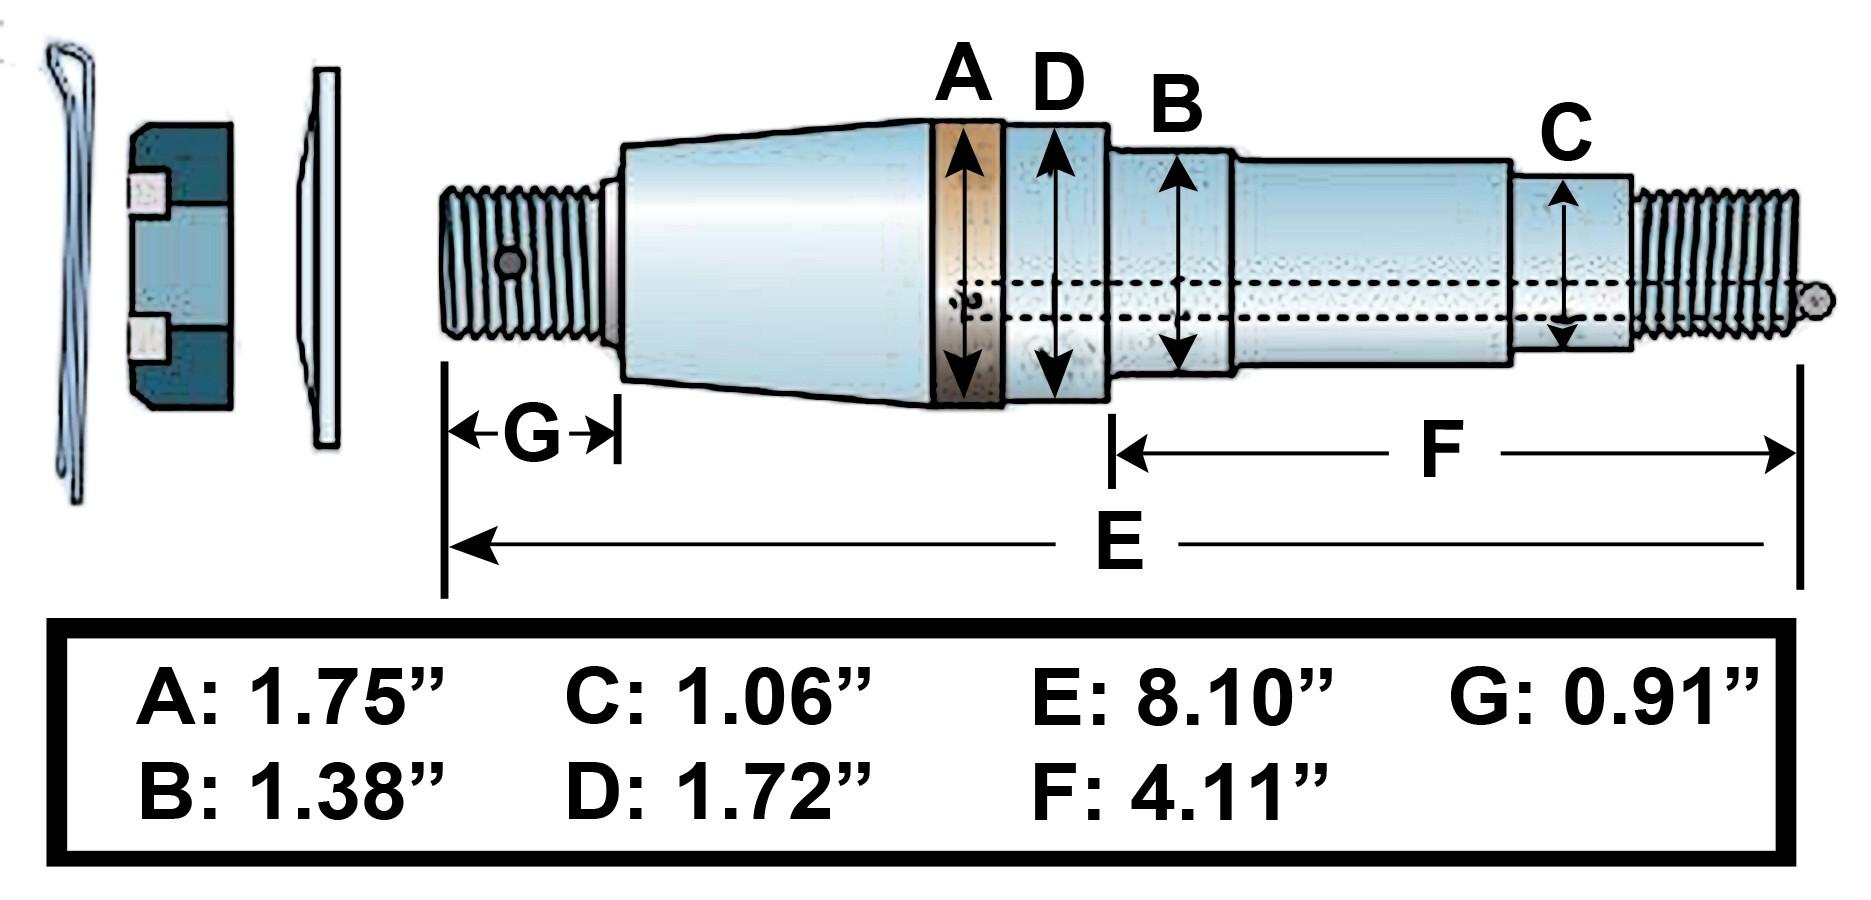 Load Rite Trailer Wiring Diagram Electrical Diagrams Dual Battery Road King